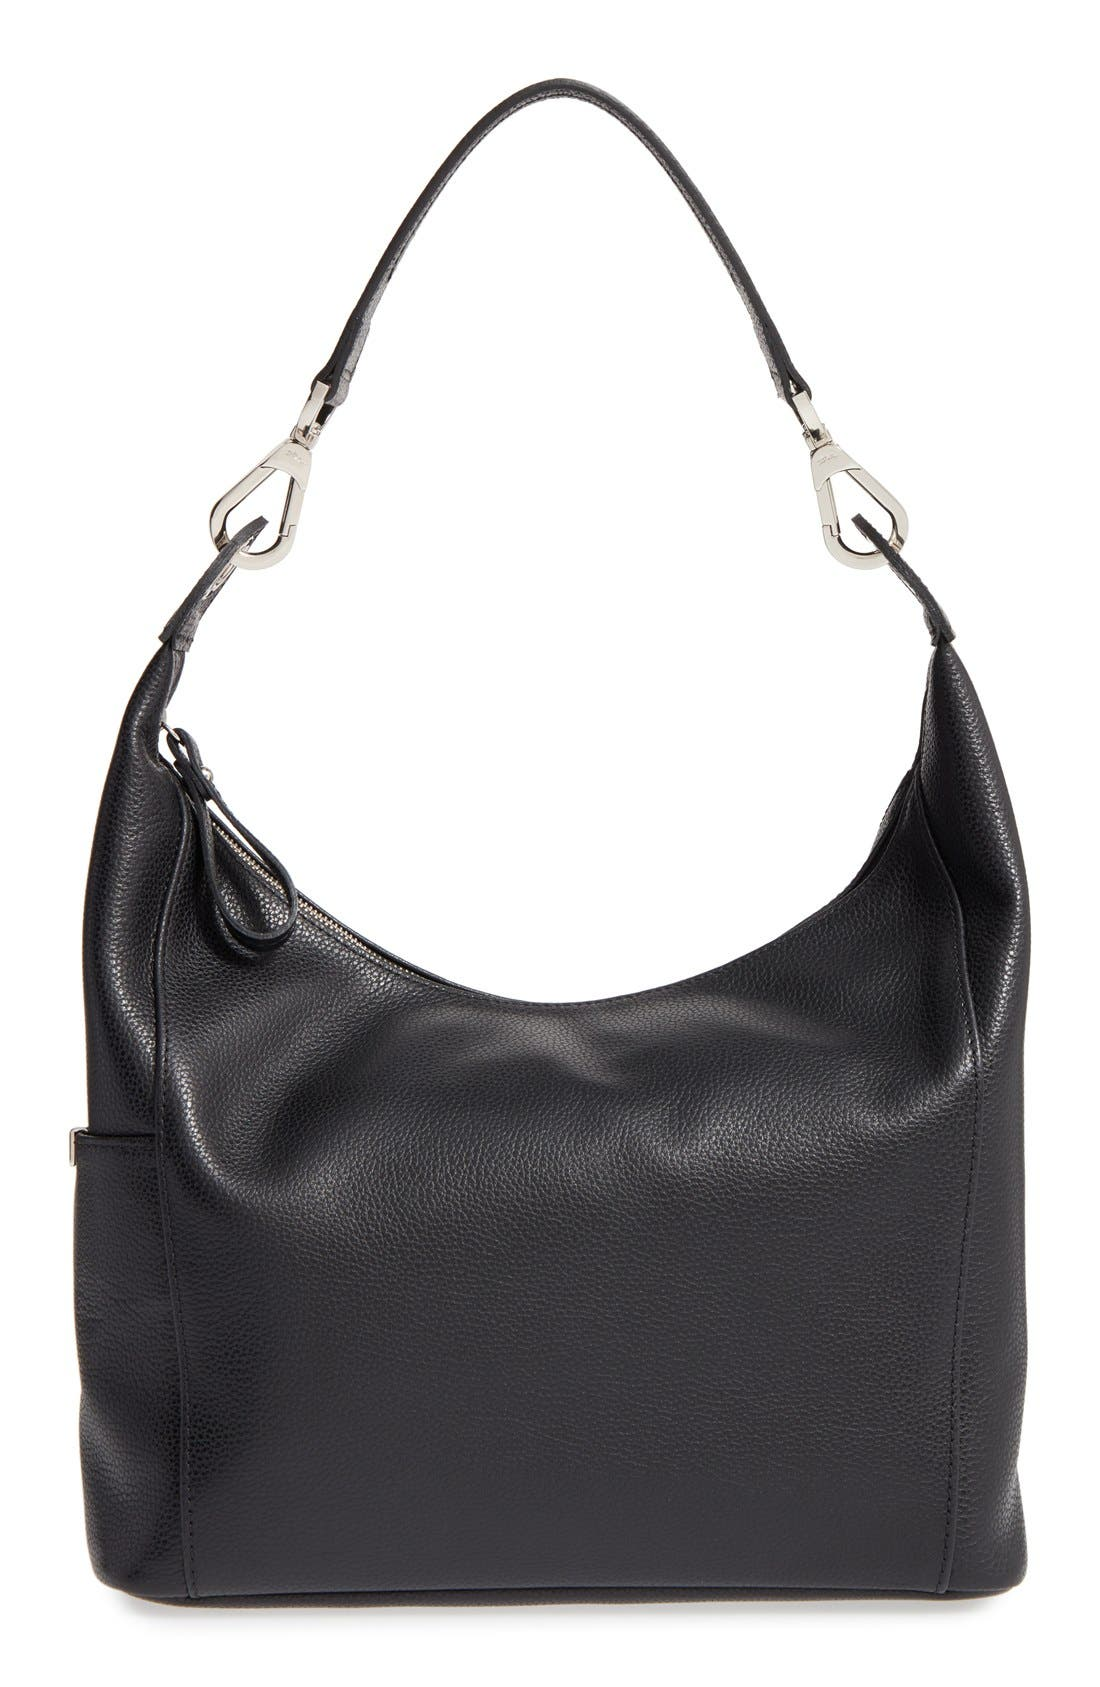 'Le Foulonne' Leather Hobo Bag,                             Main thumbnail 1, color,                             BLACK